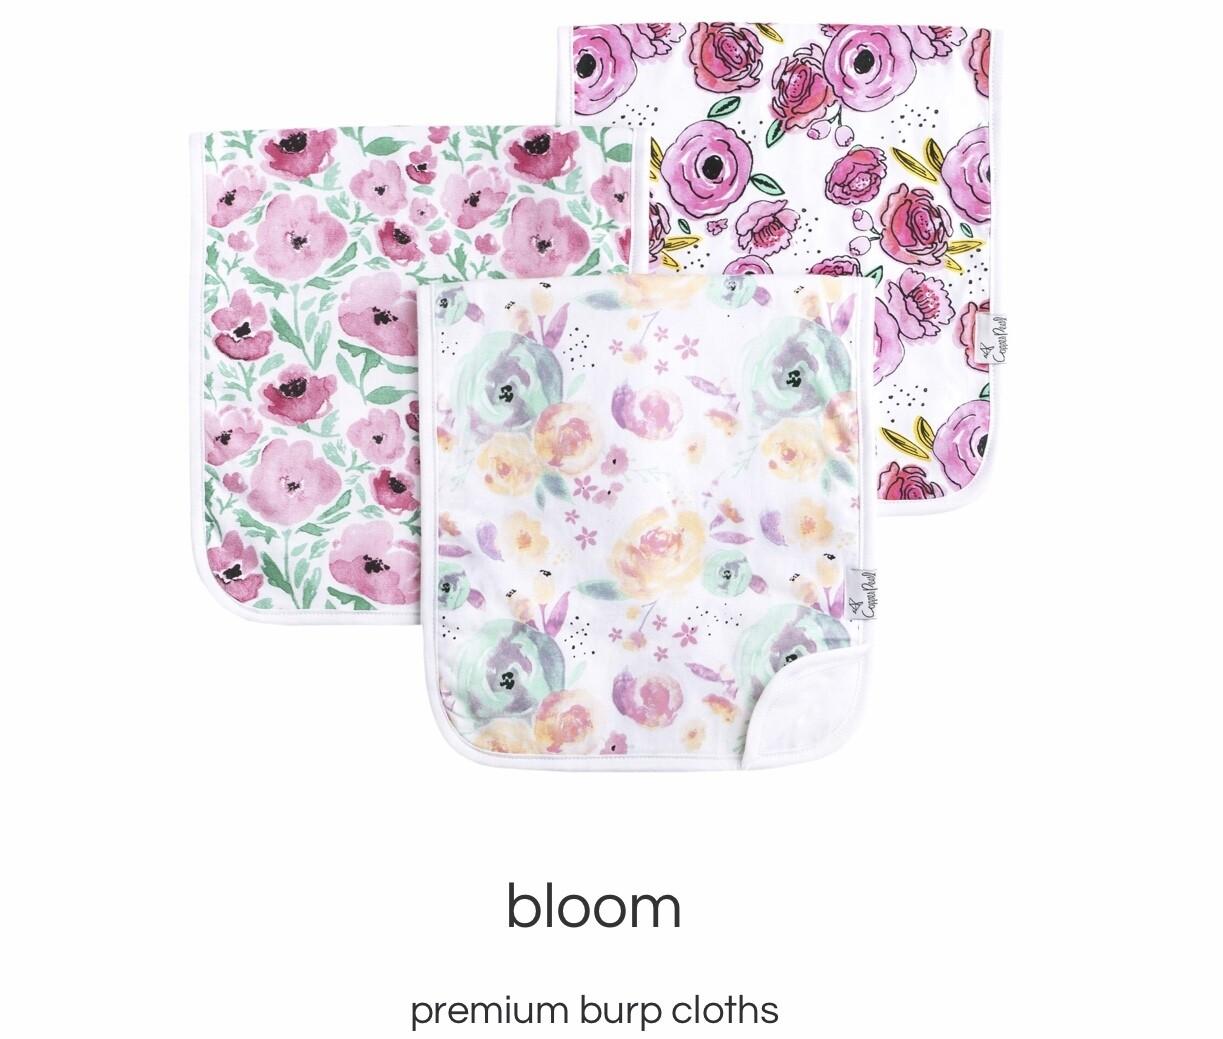 Bloom Burp Cloth Set